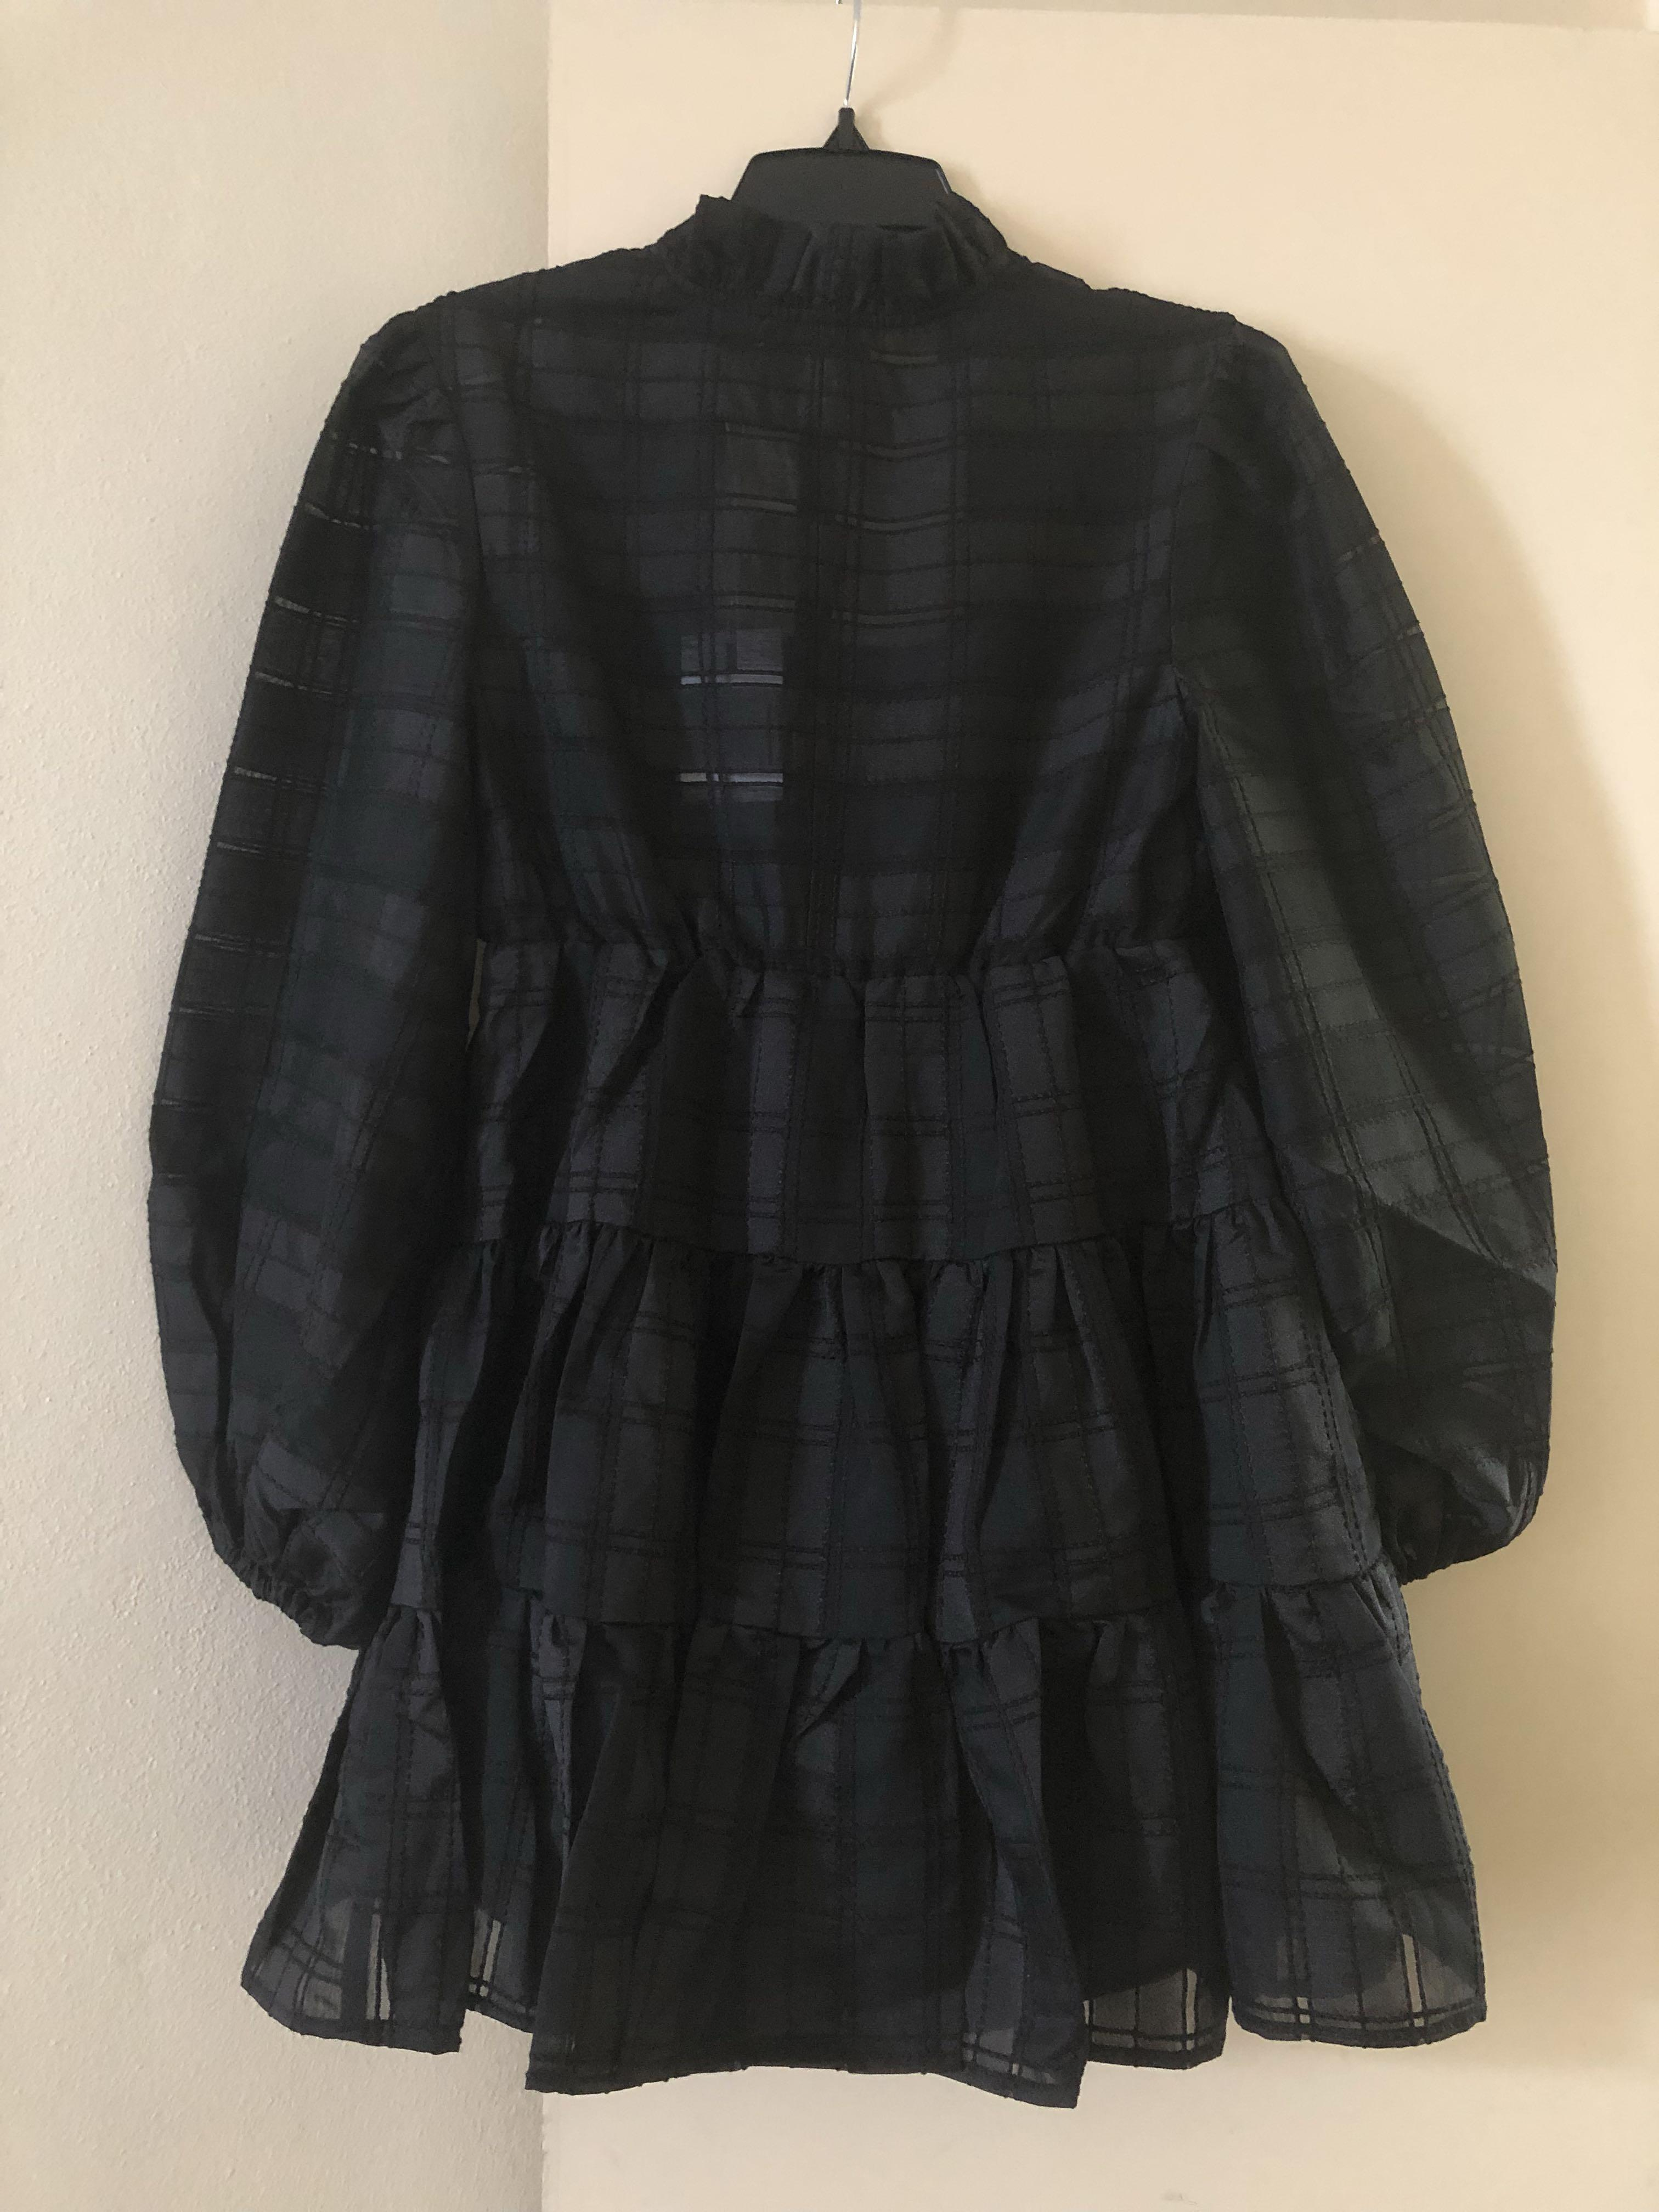 C/Meo Collective Mini Black Dress Size XS / AU UK 6/ US 0-2